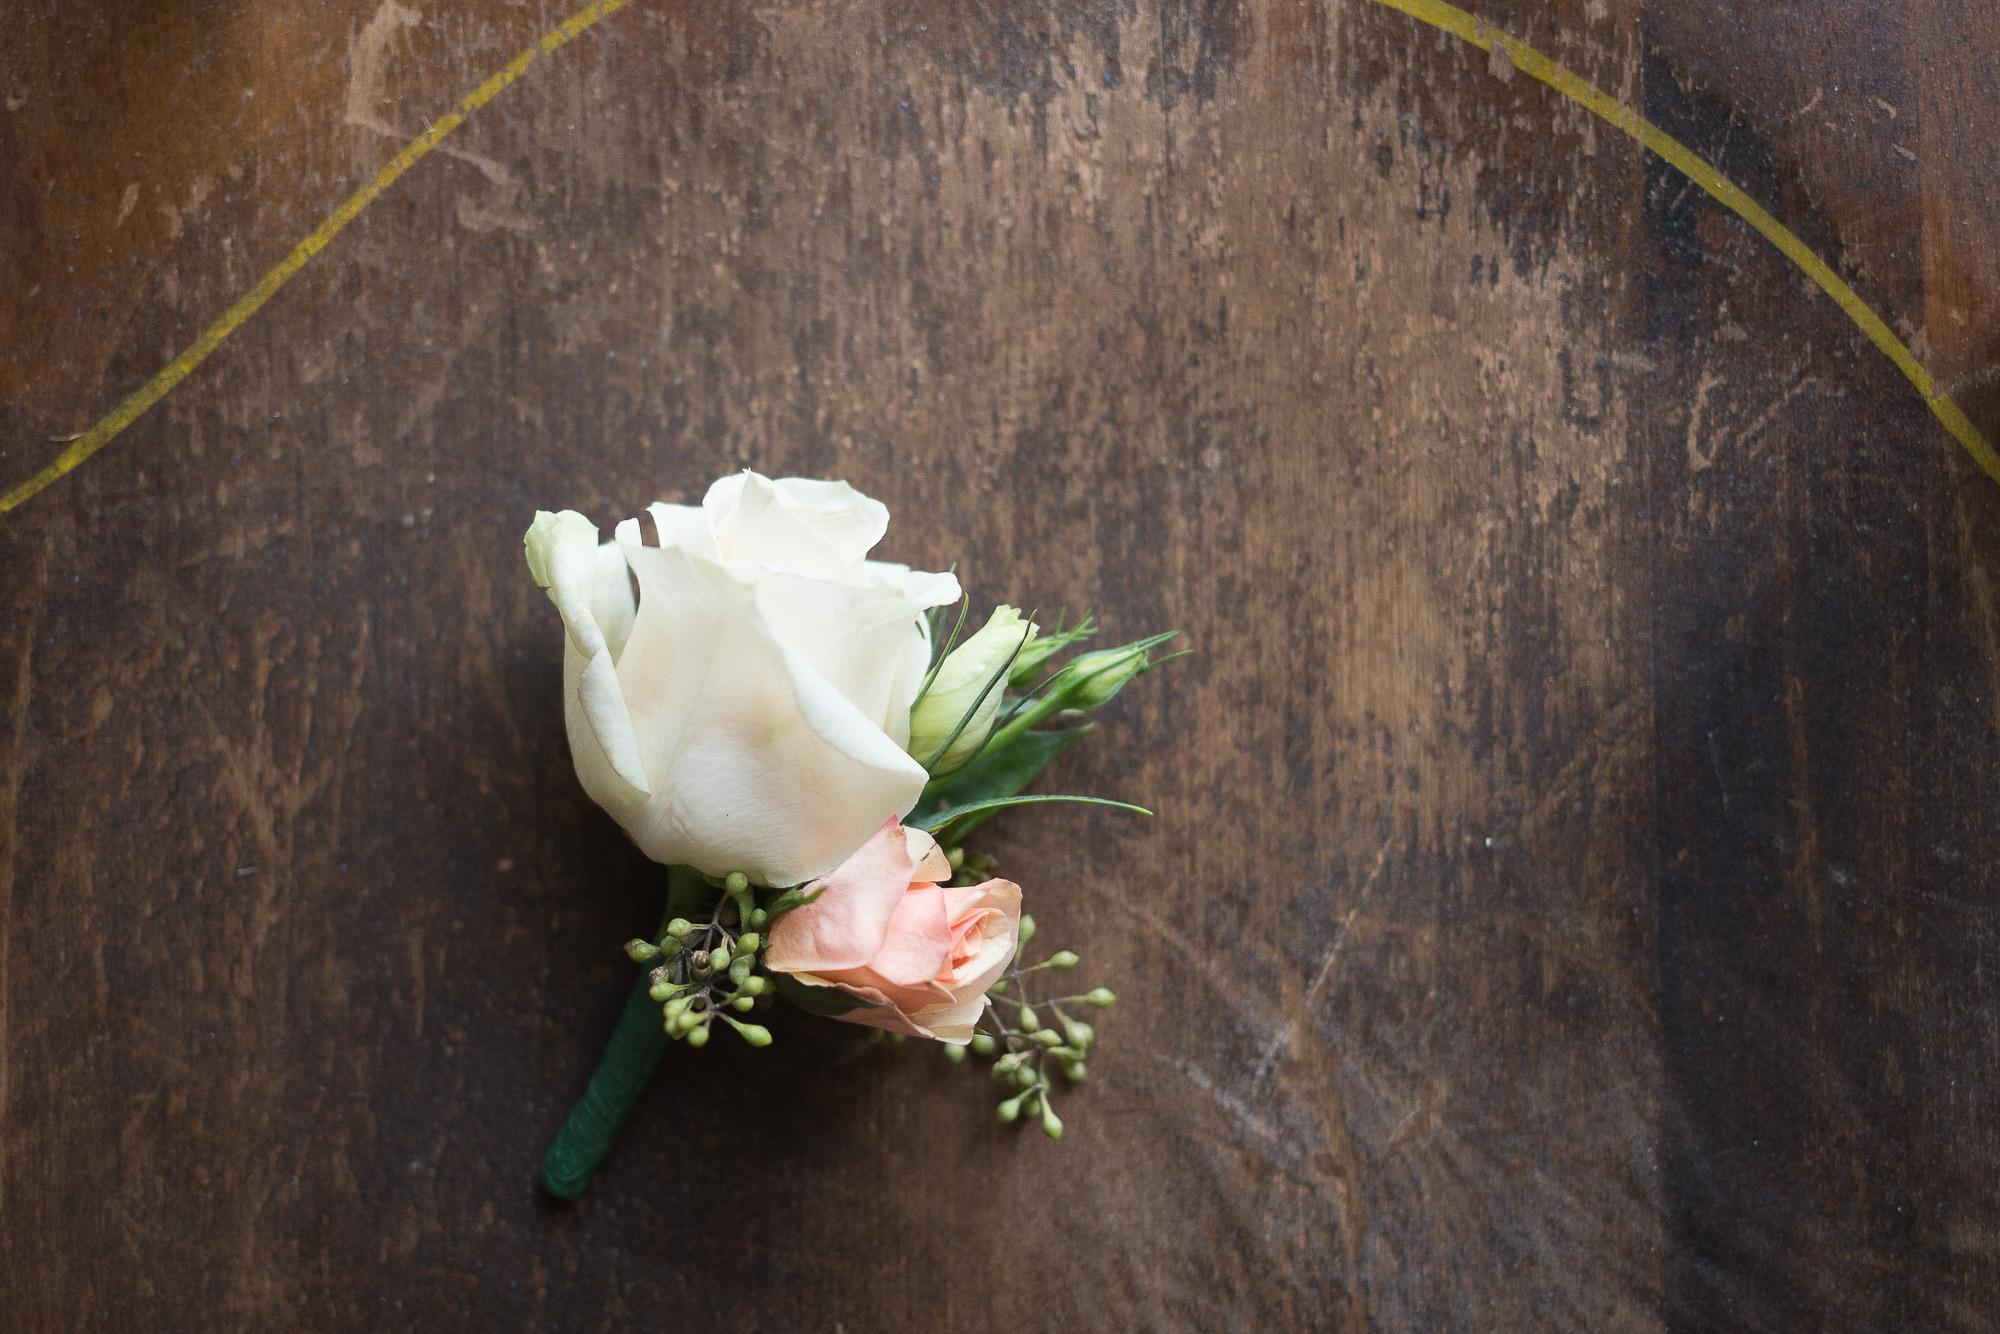 Brillion Wisconsin Wedding Photographer | Whit Meza Photography